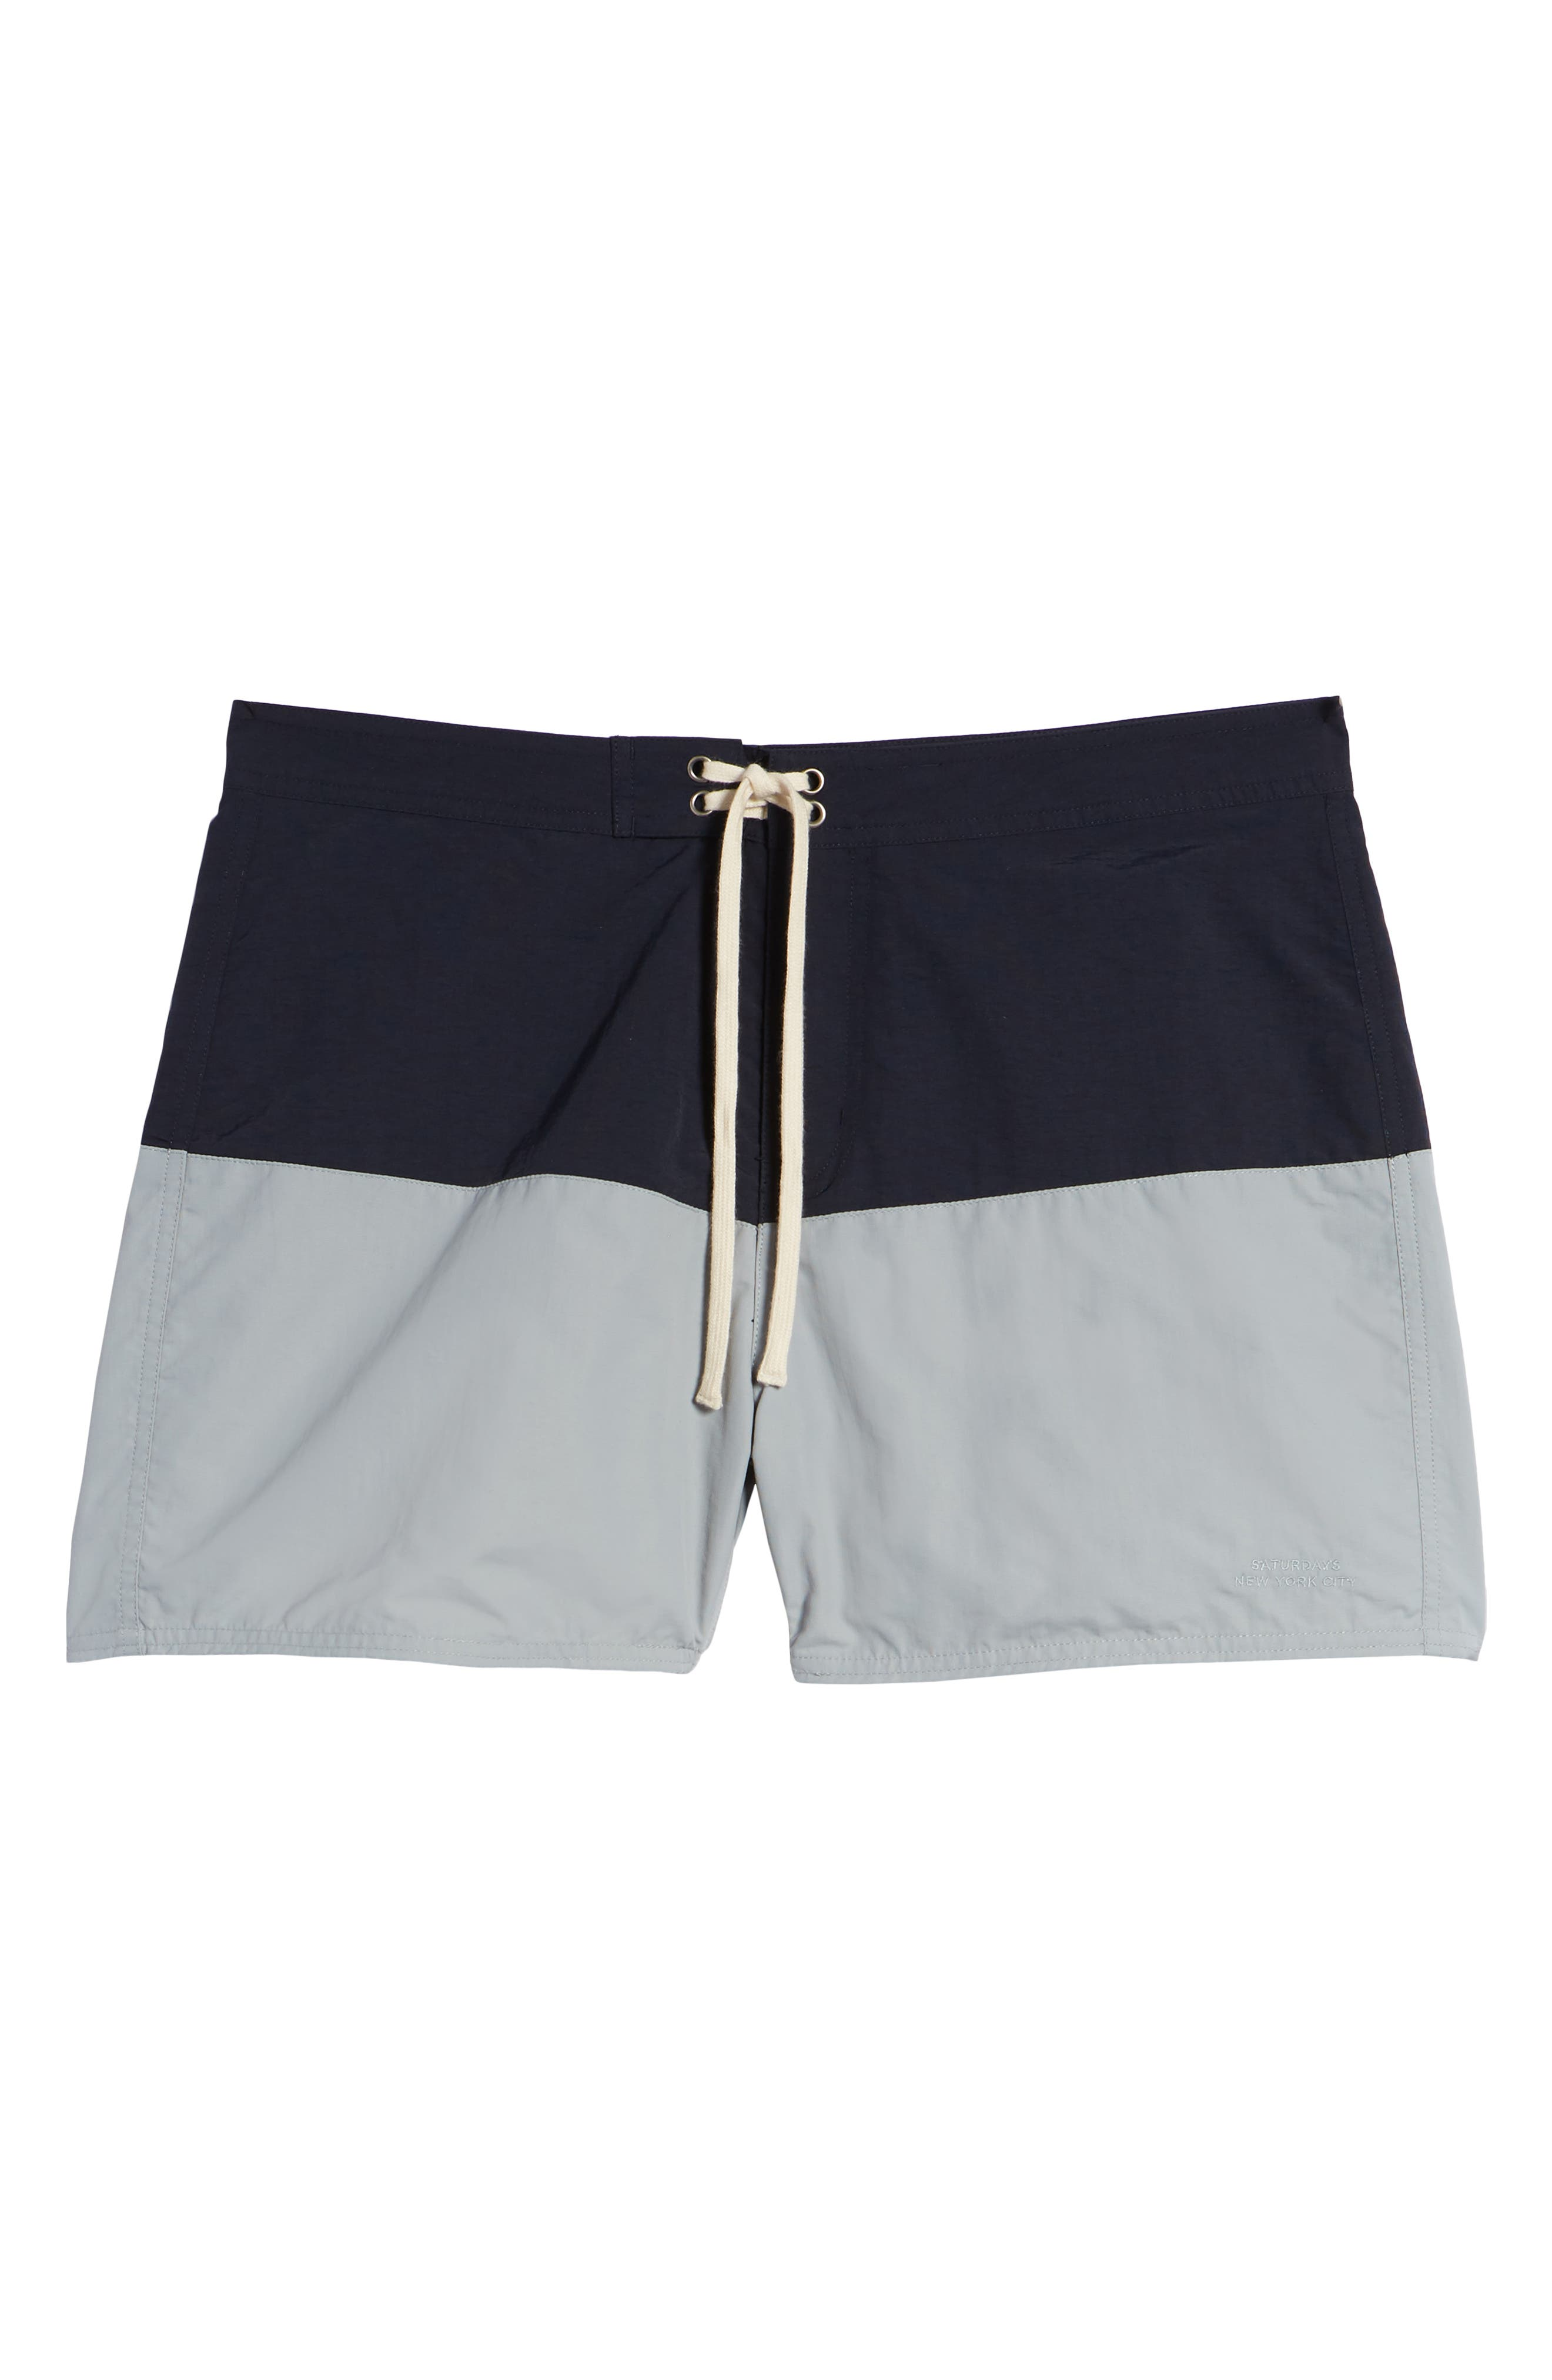 Ennis Board Shorts,                             Alternate thumbnail 6, color,                             MIDNIGHT/ STONE BLUE